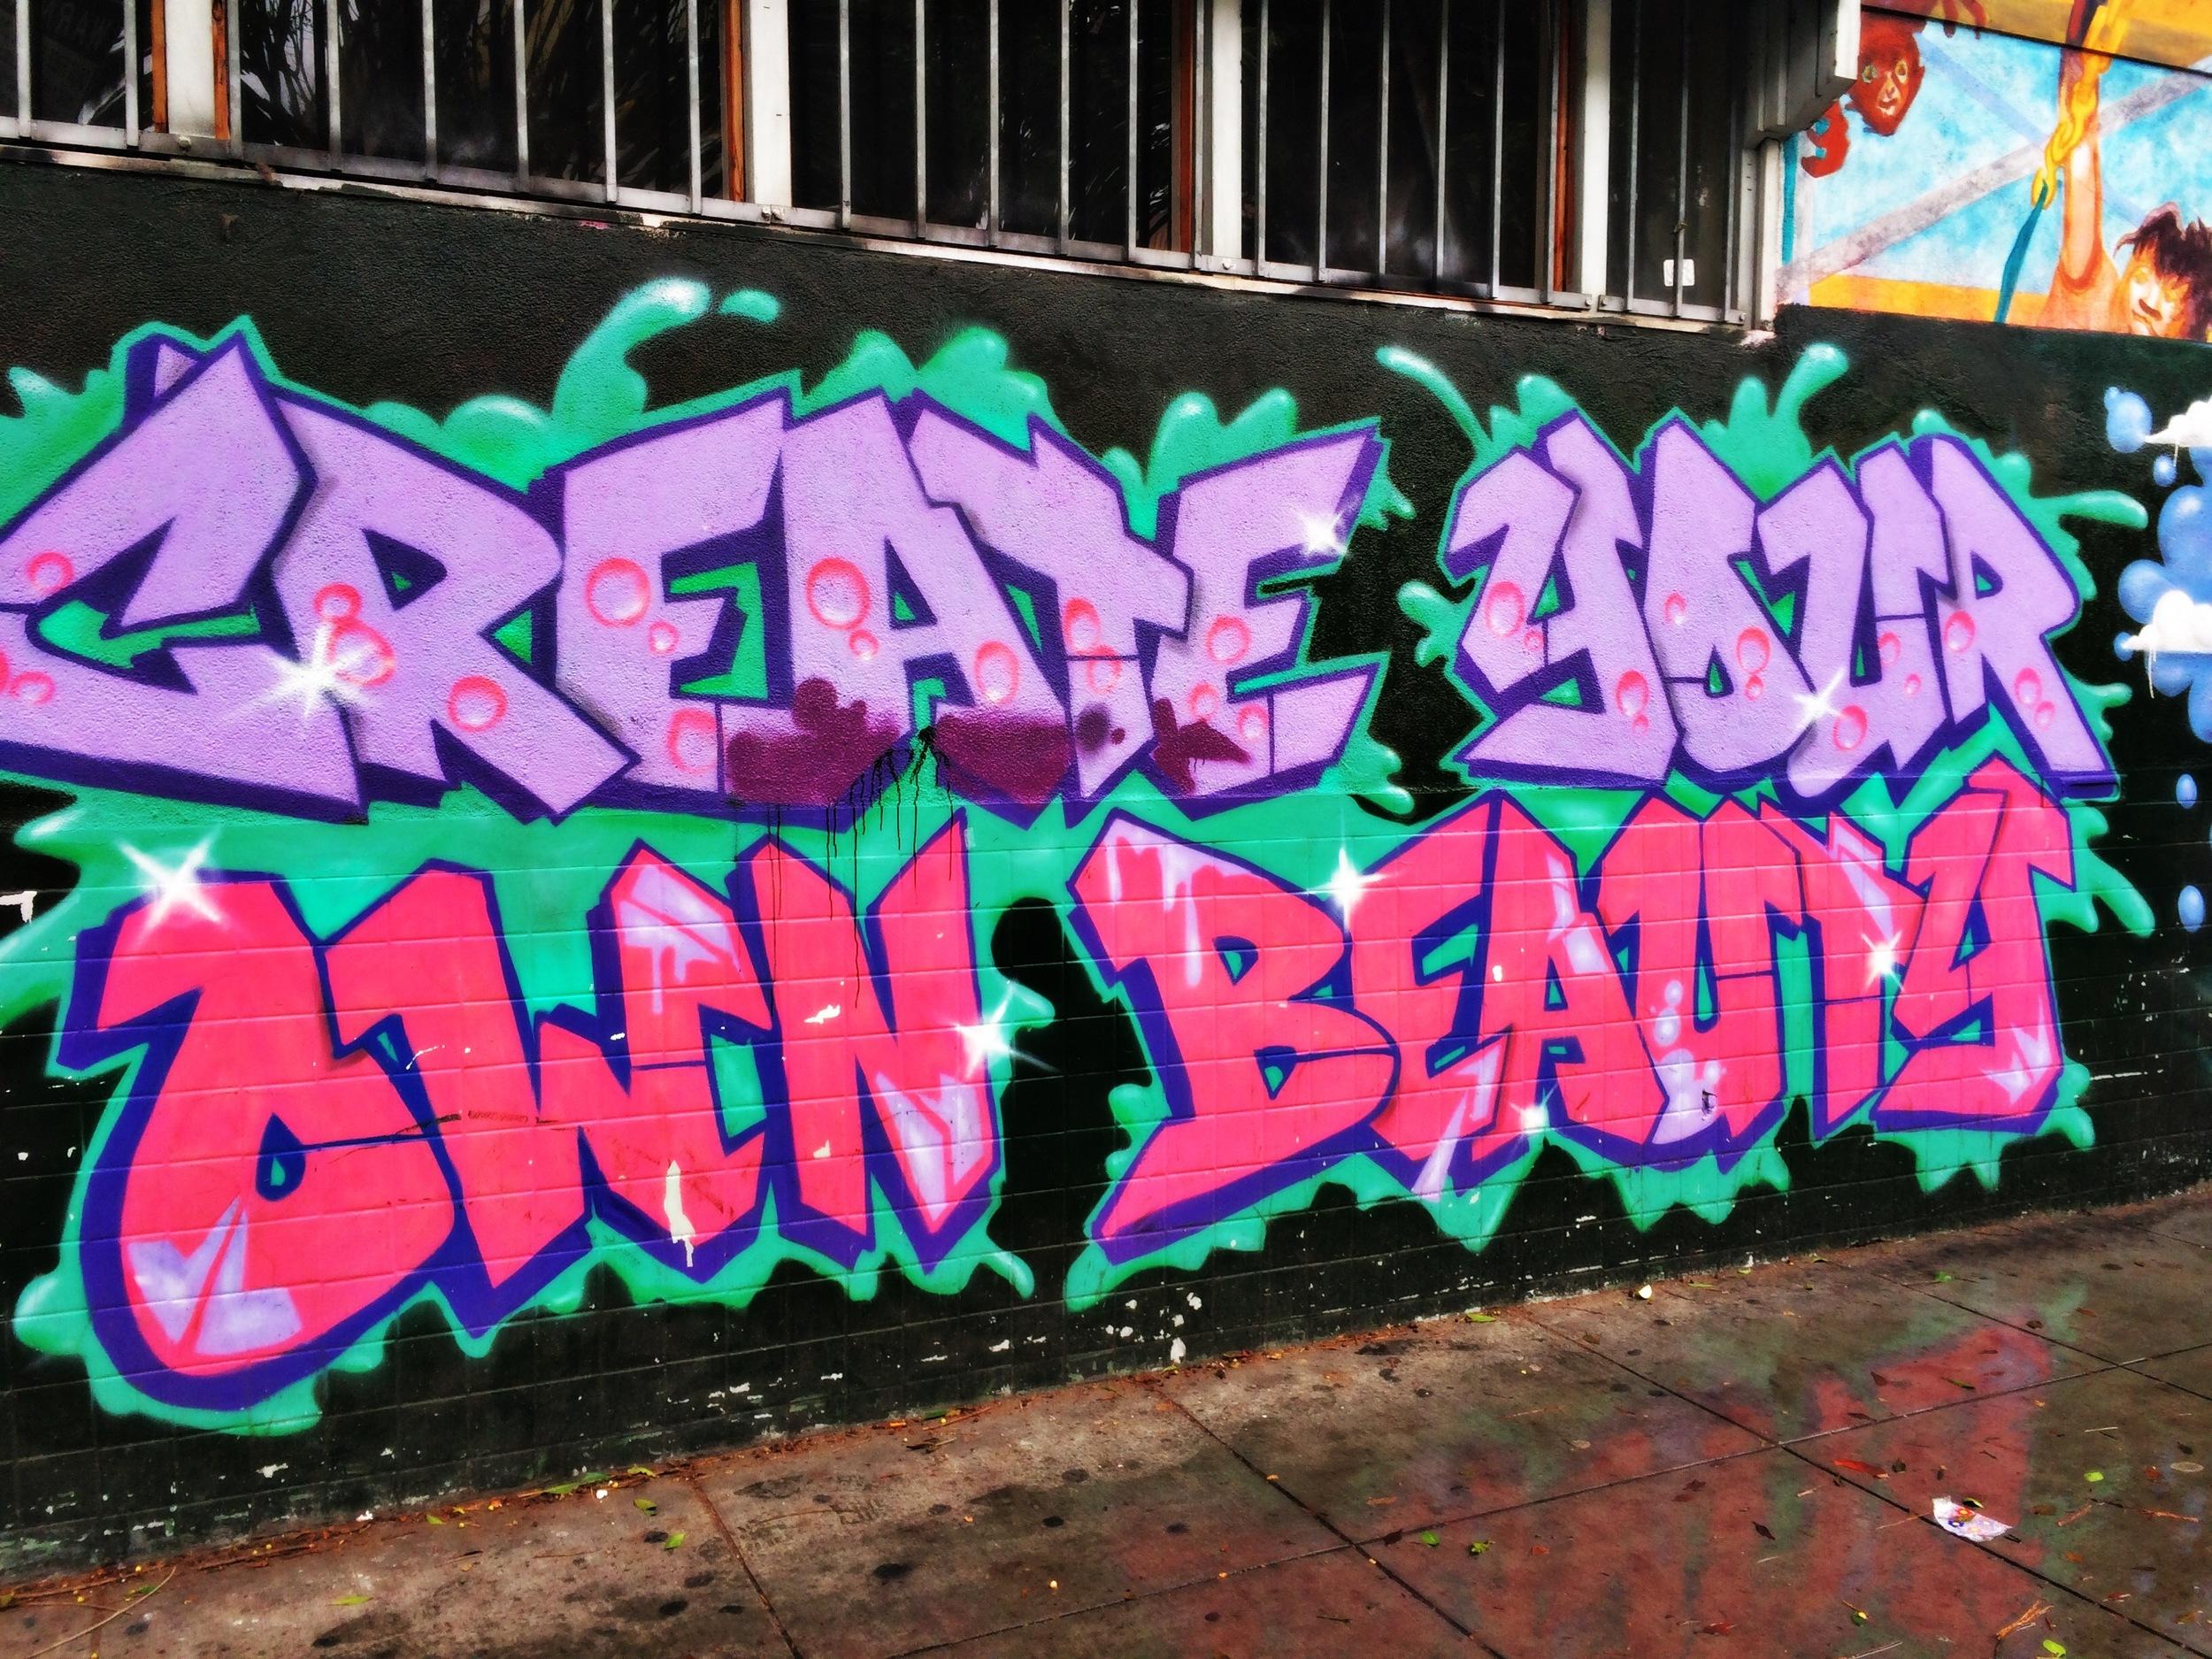 create your own beauty street art